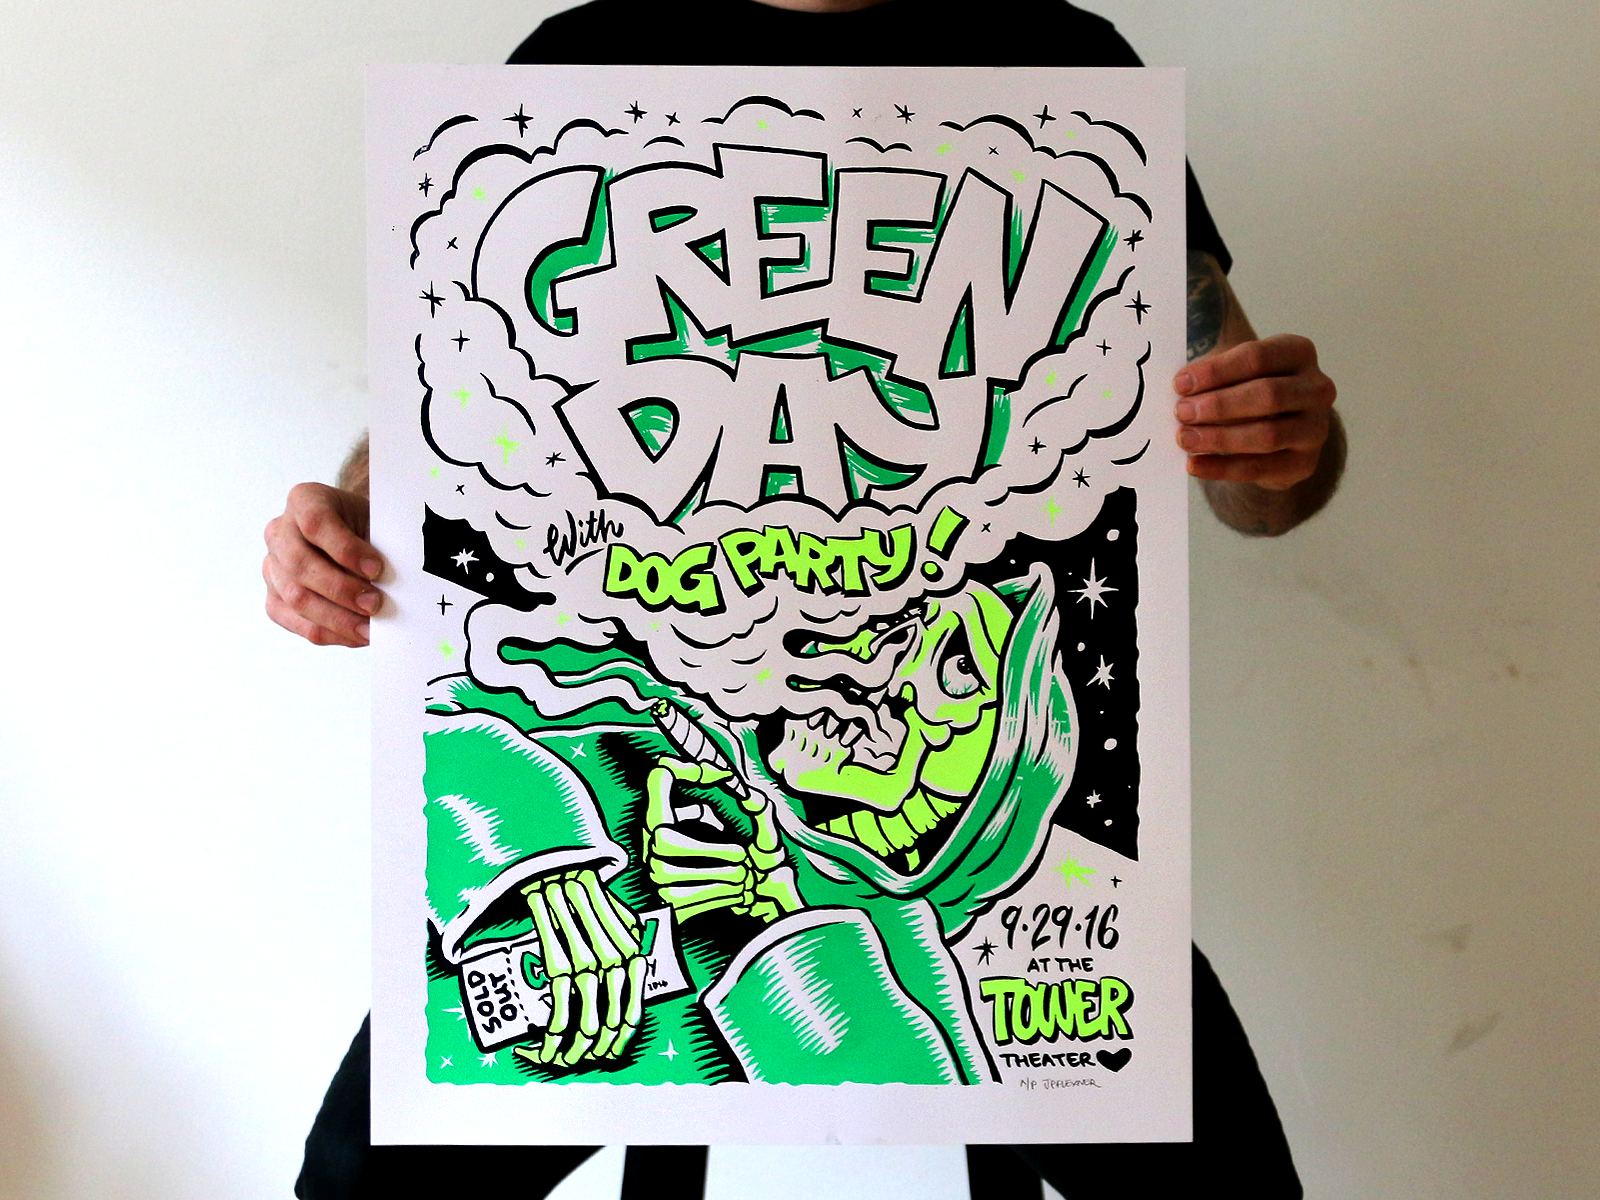 JP_Poster_GreenDay_No1_Full.png